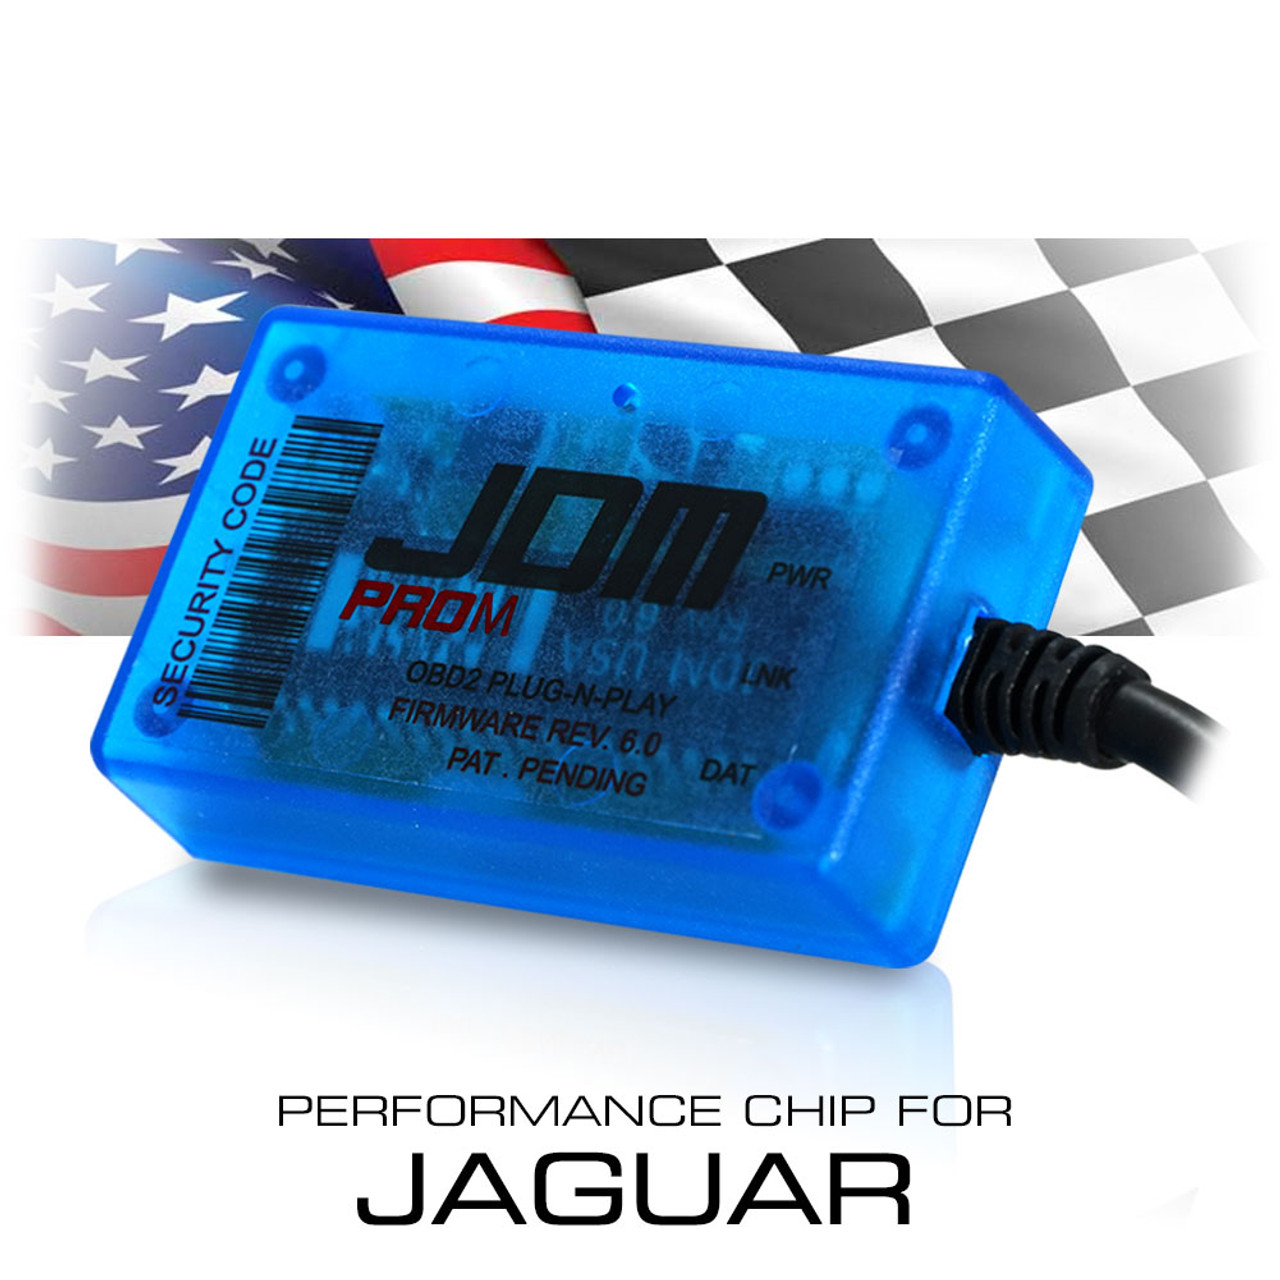 Beaches] Jaguar xjr chip tuning